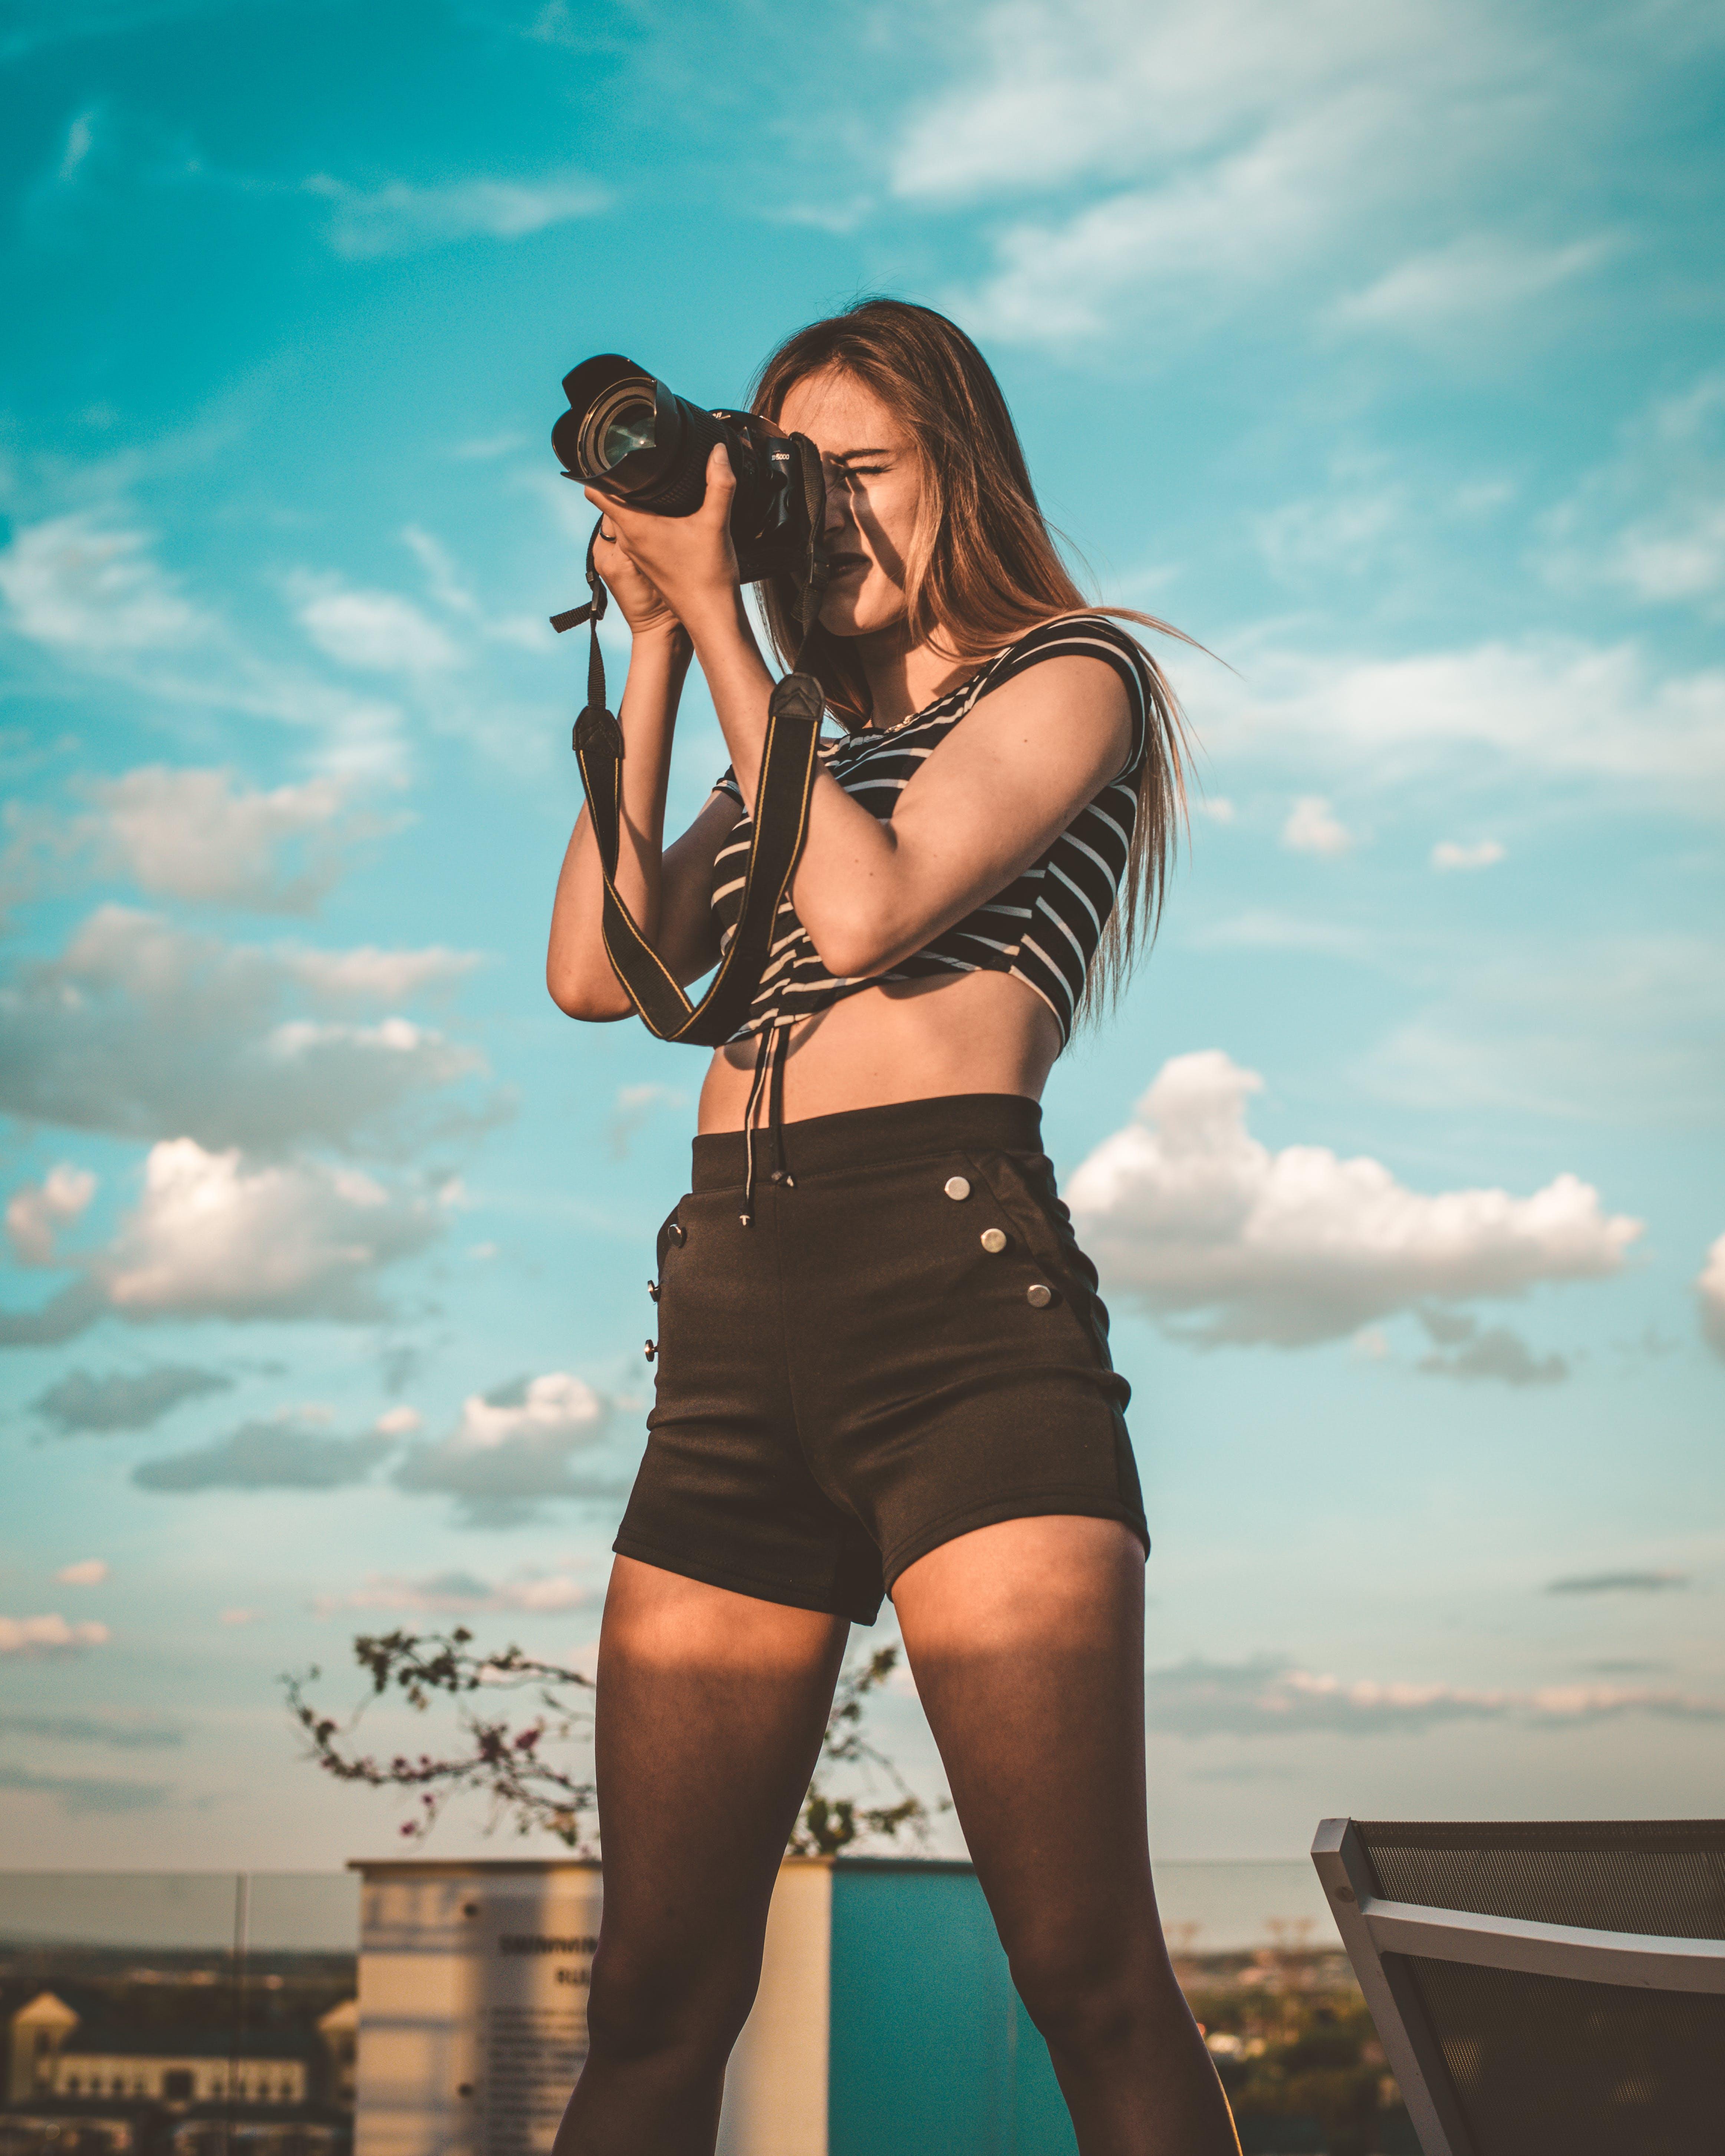 Photo of Woman Holding Dslr Camera